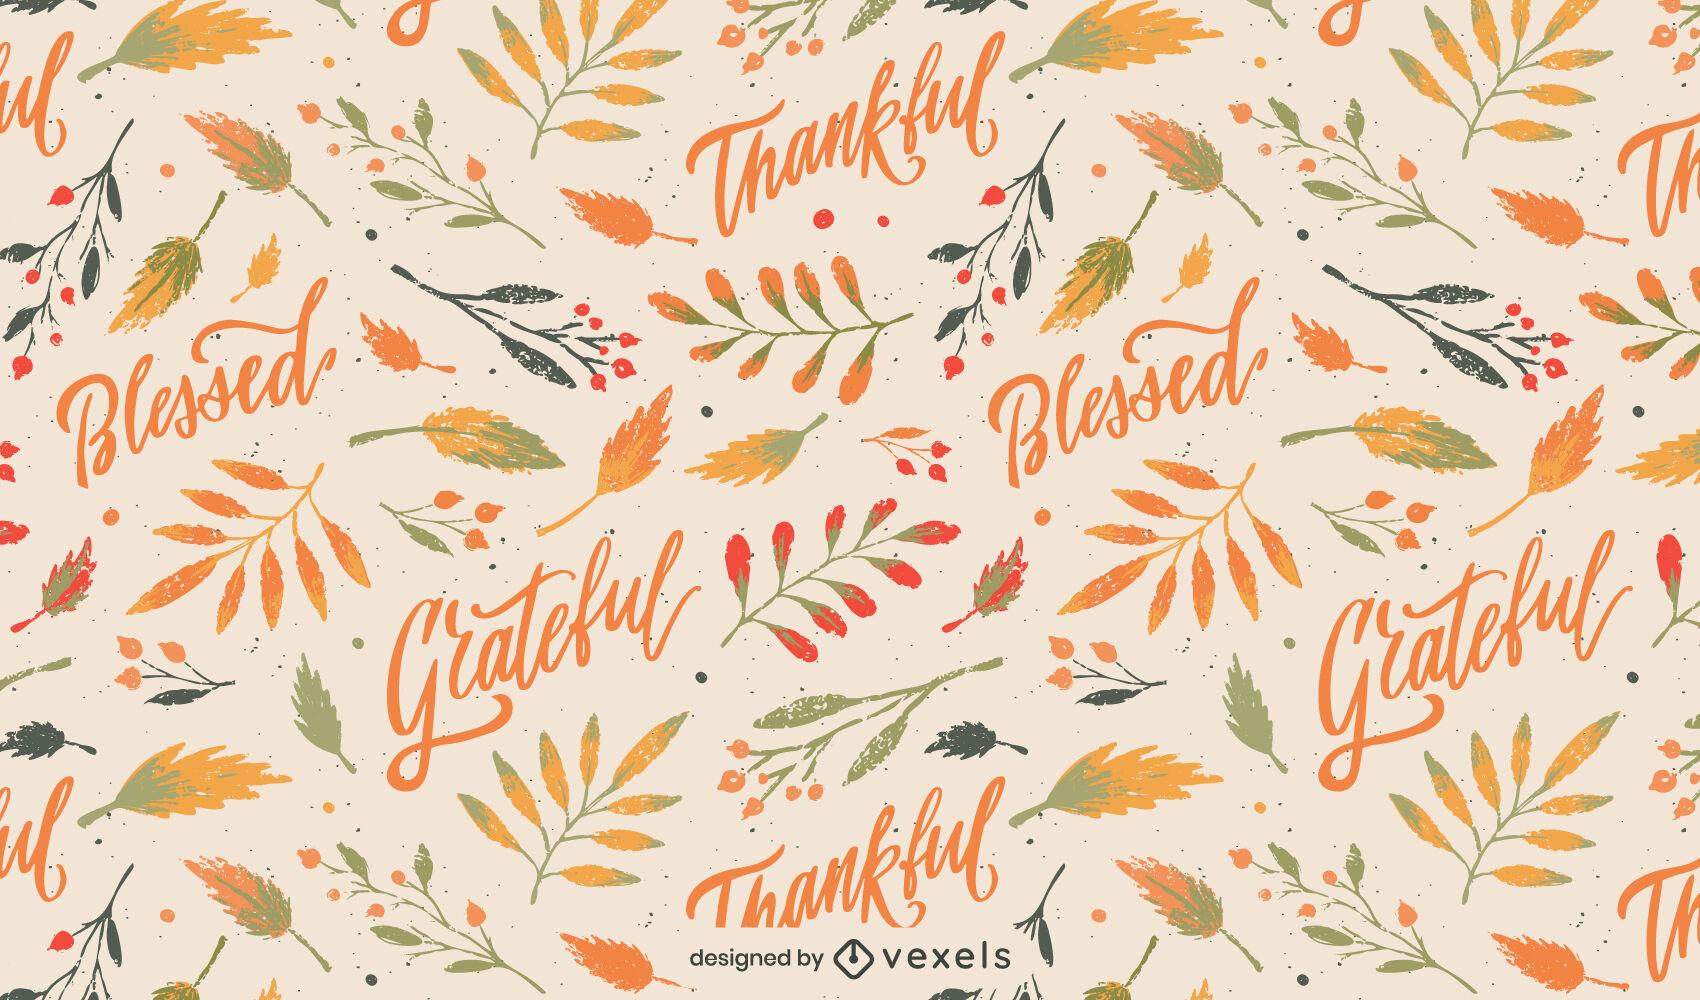 Thanksgiving lettering nature pattern design